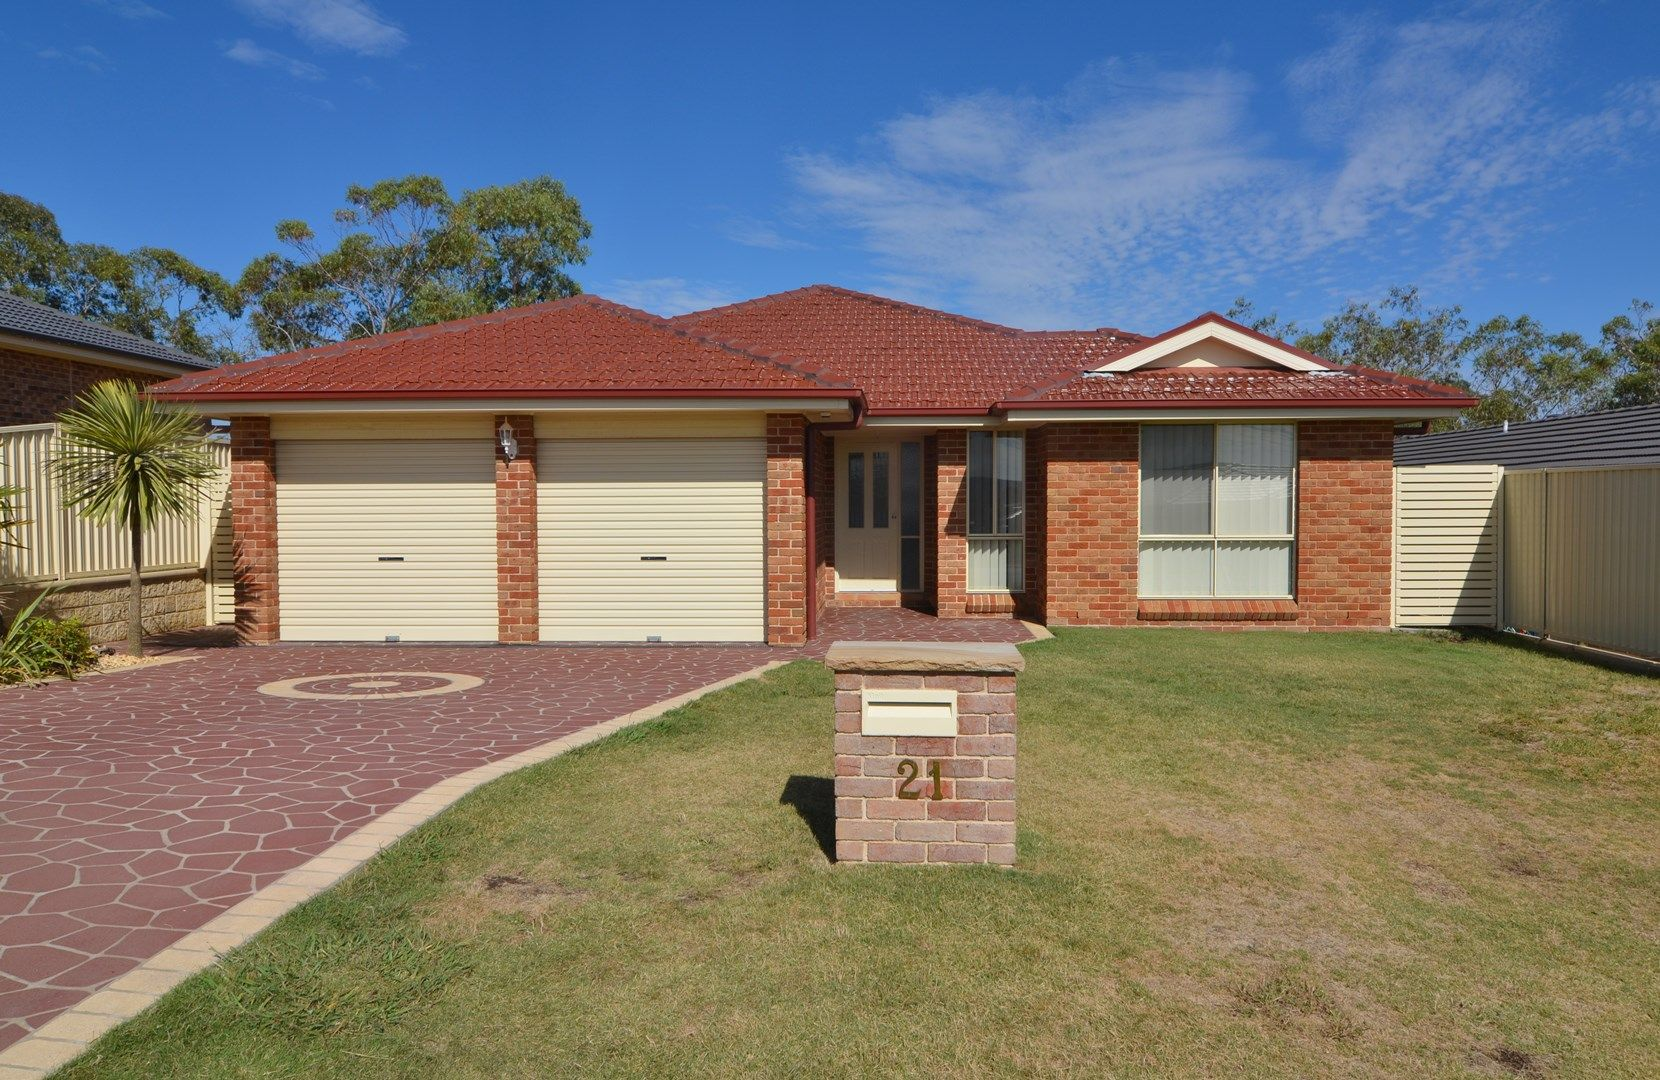 21 Henning Crescent, Wallerawang NSW 2845, Image 0